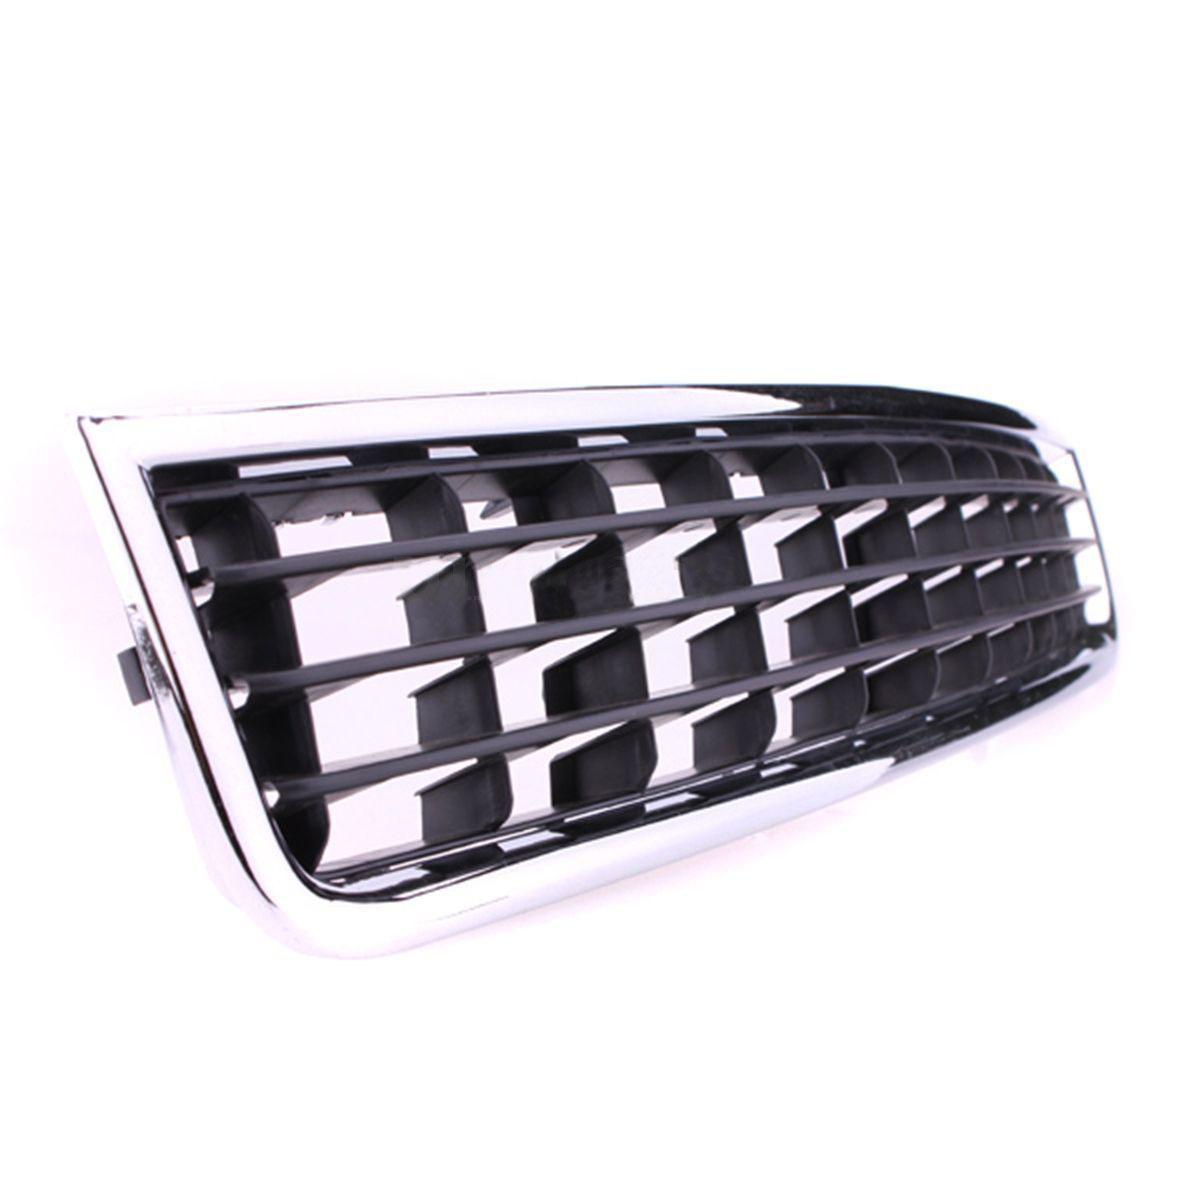 Black Chrome Front Bumper Lower Centre Grille Trim For